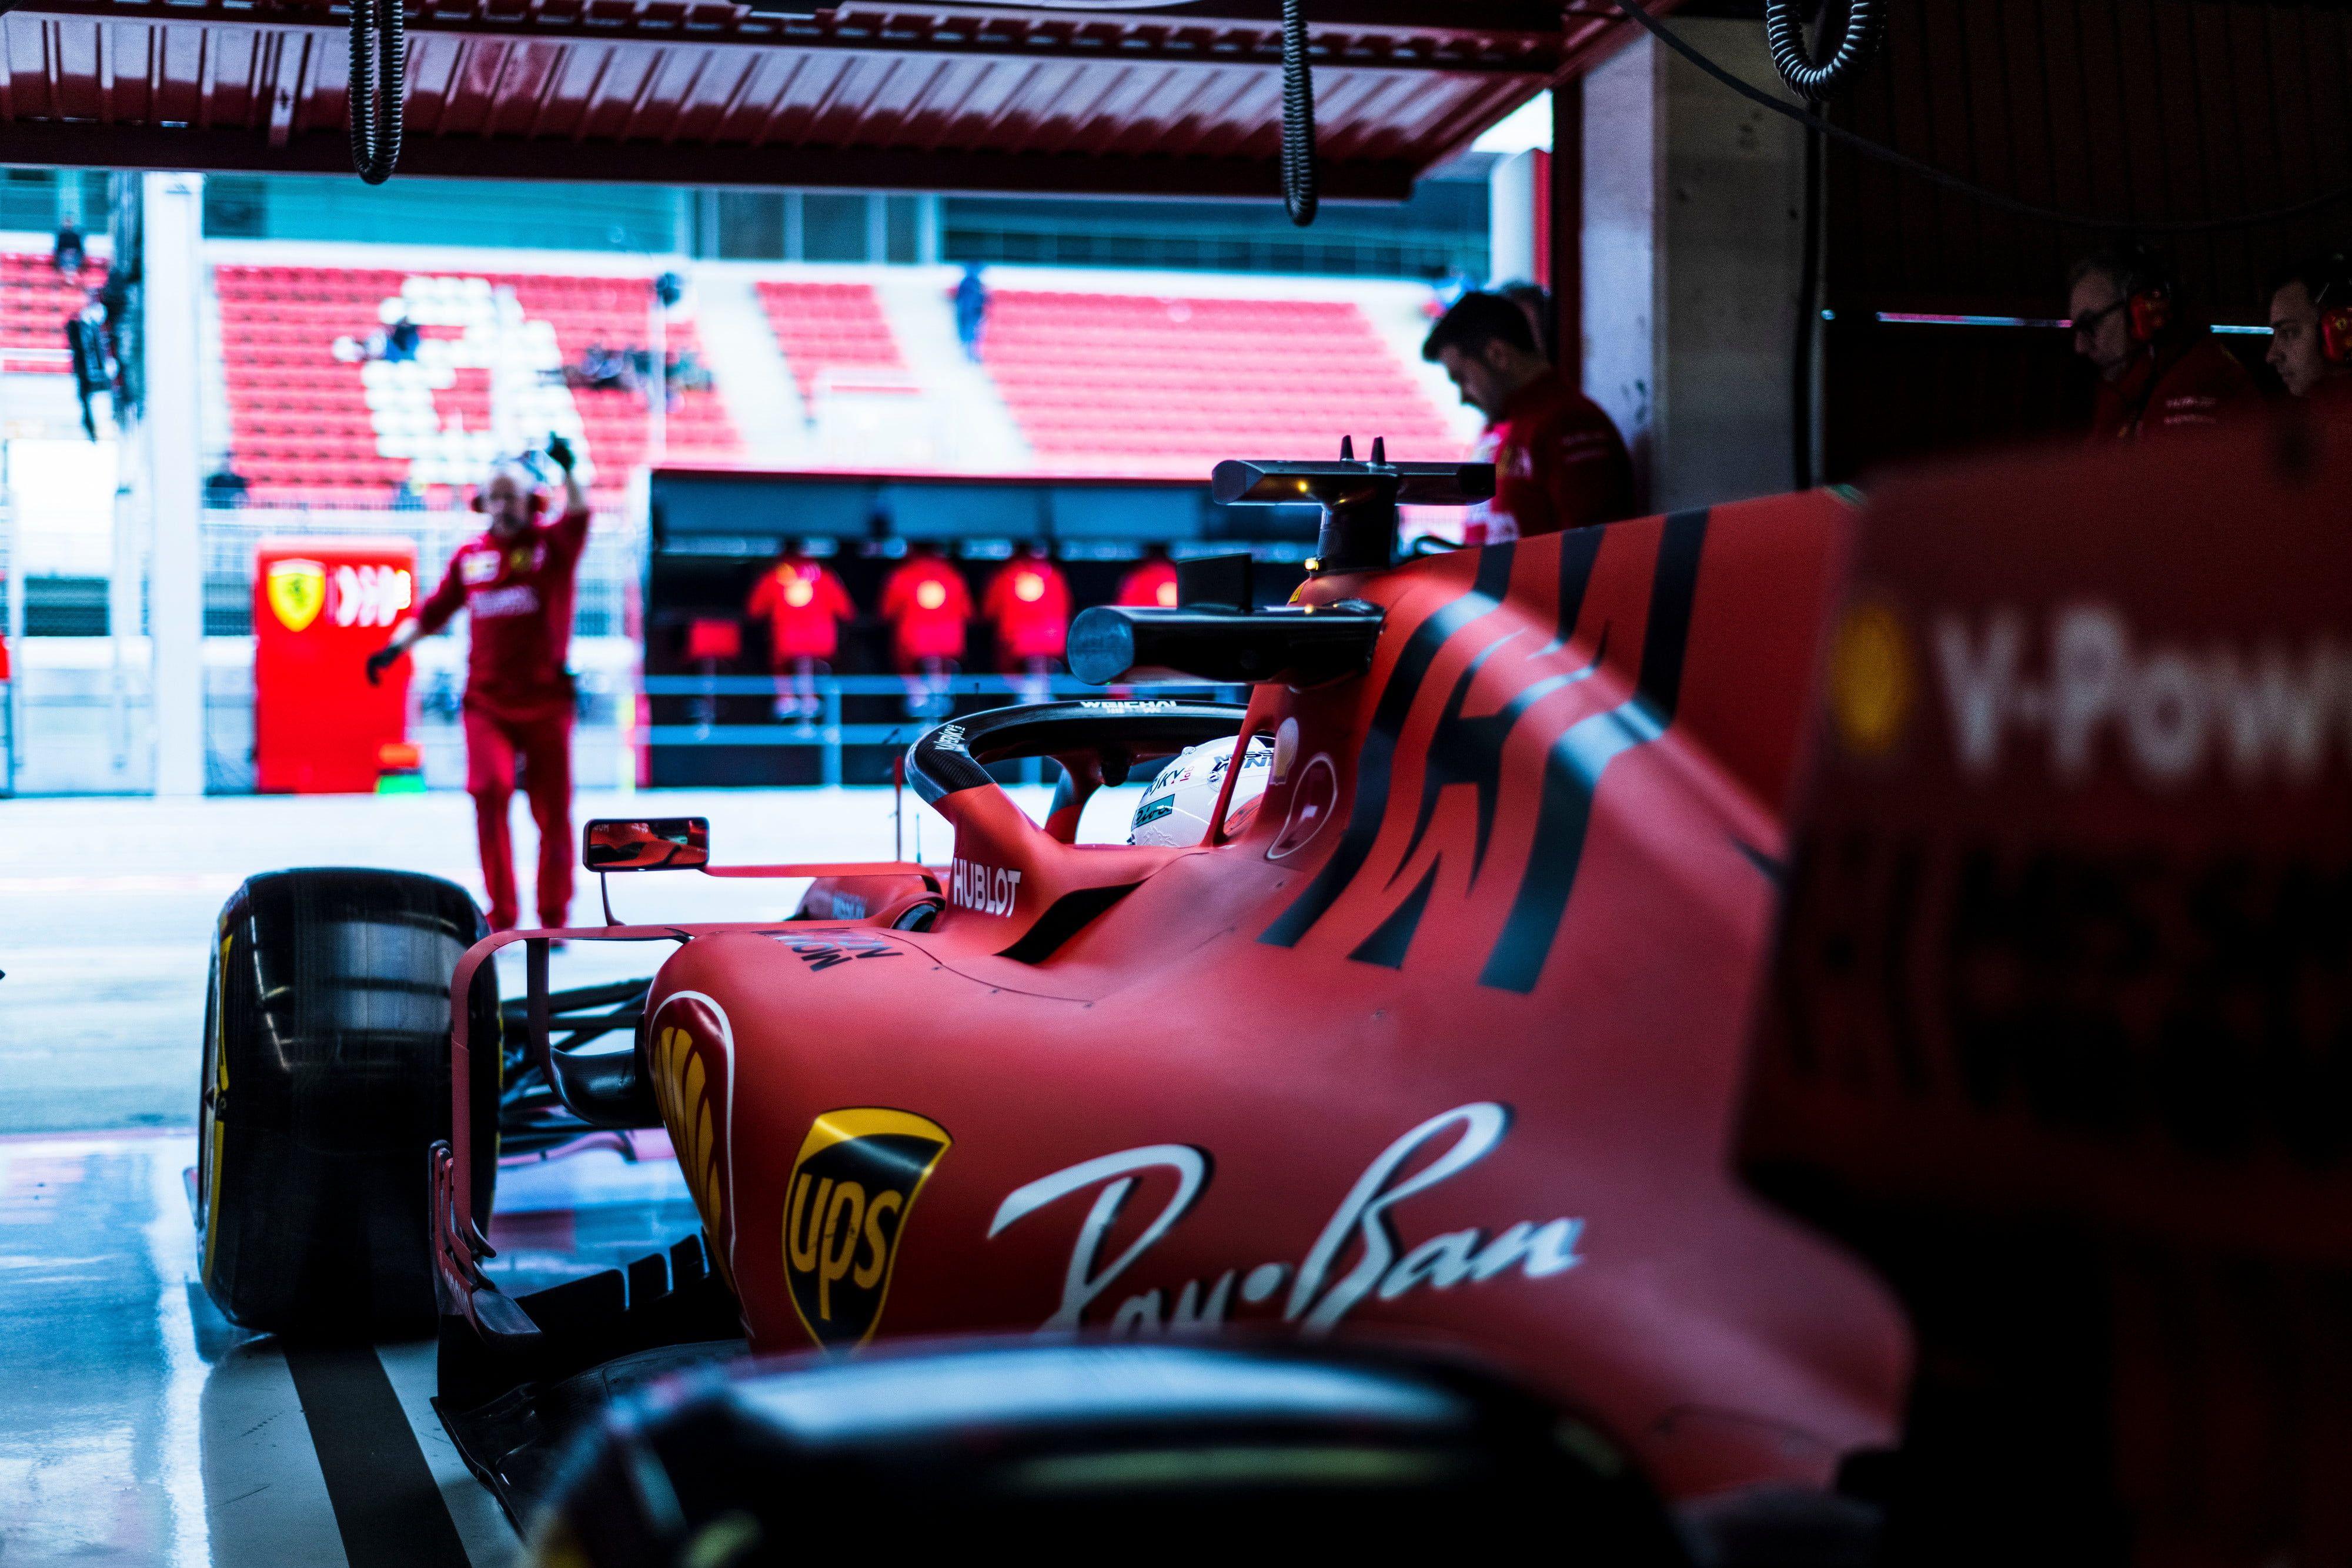 Ferrari Formula 1 Sebastian Vettel 2019 4k Wallpaper Hdwallpaper Desktop In 2020 Formula 1 Ferrari Ferrari F1